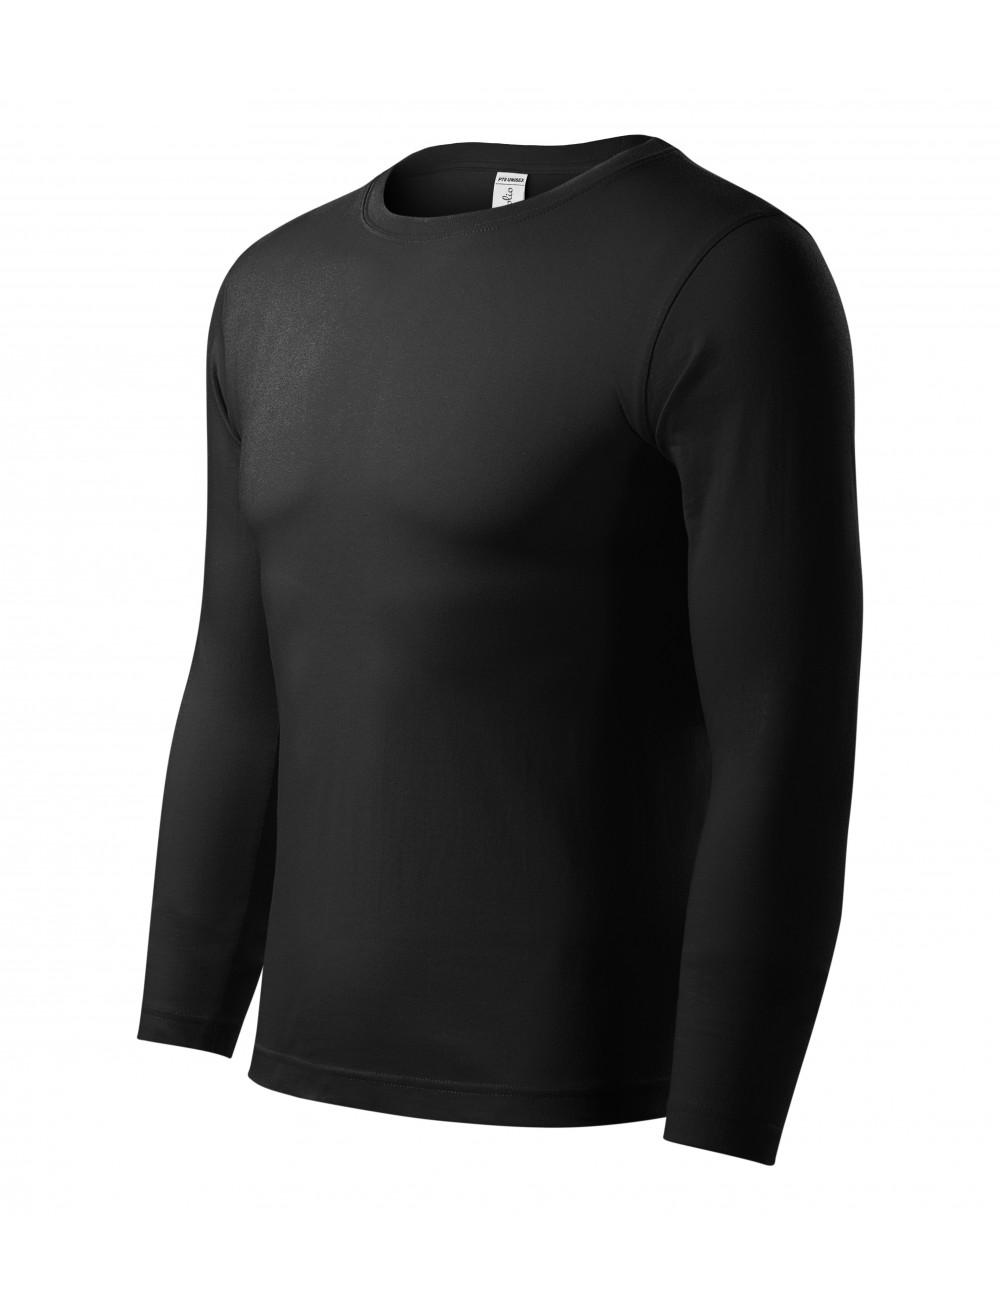 Adler PICCOLIO Koszulka unisex Progress LS P75 czarny